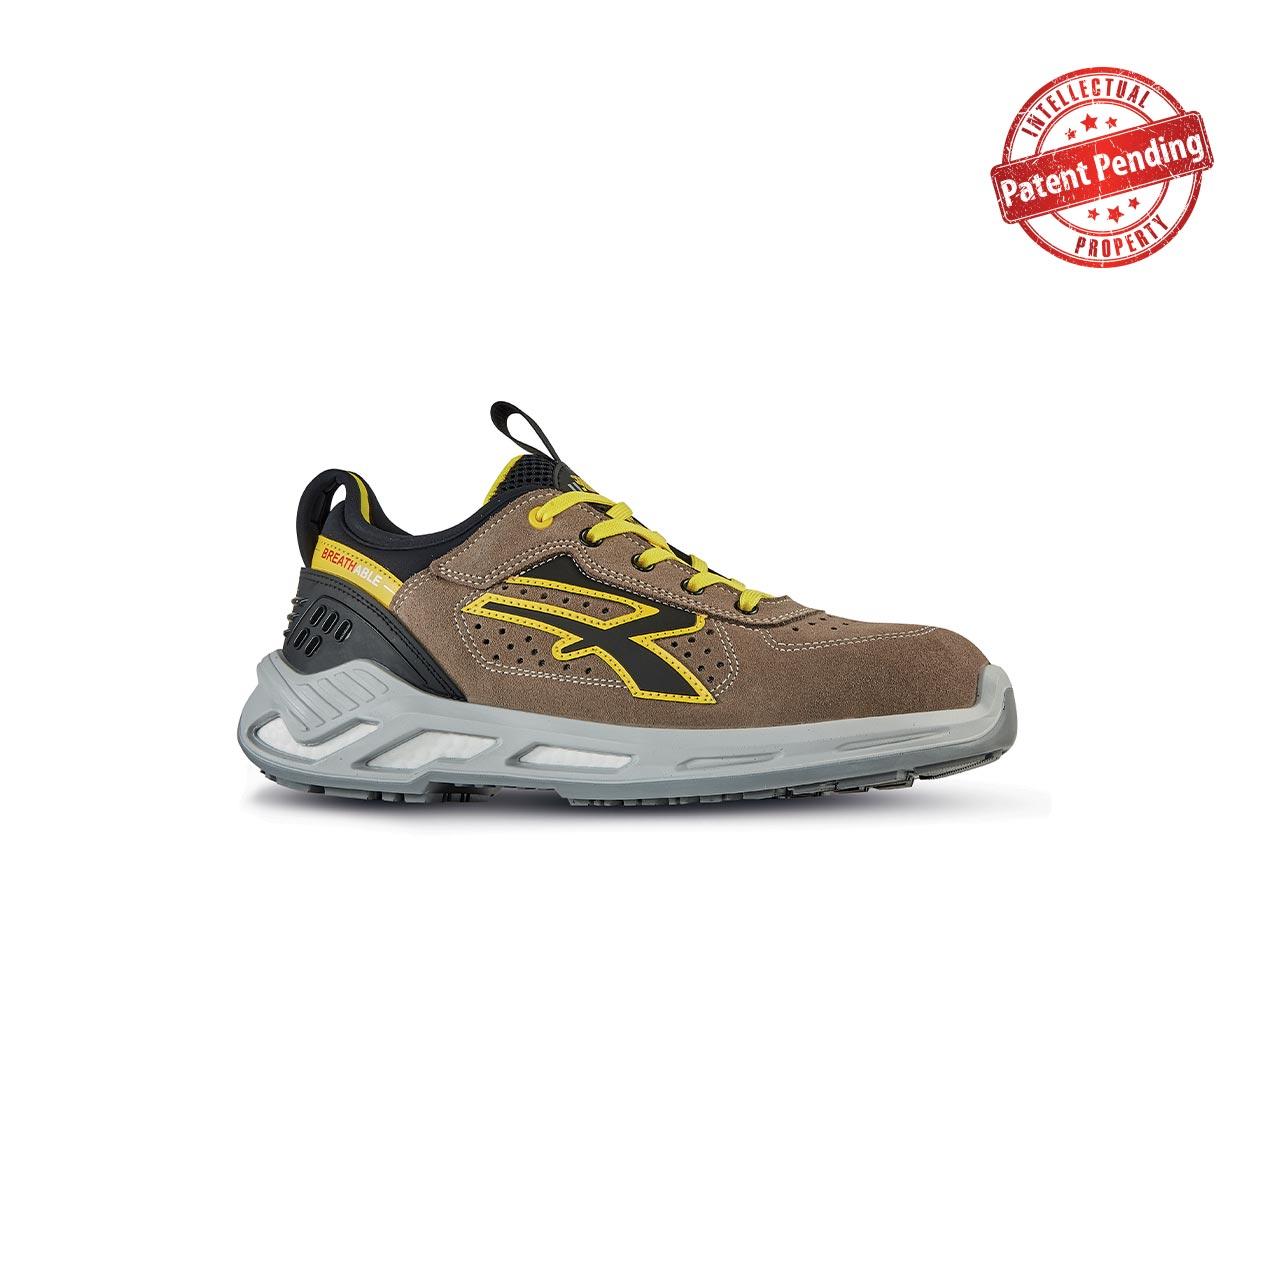 scarpa antinfortunistica upower modello curry linea red360 vista laterale